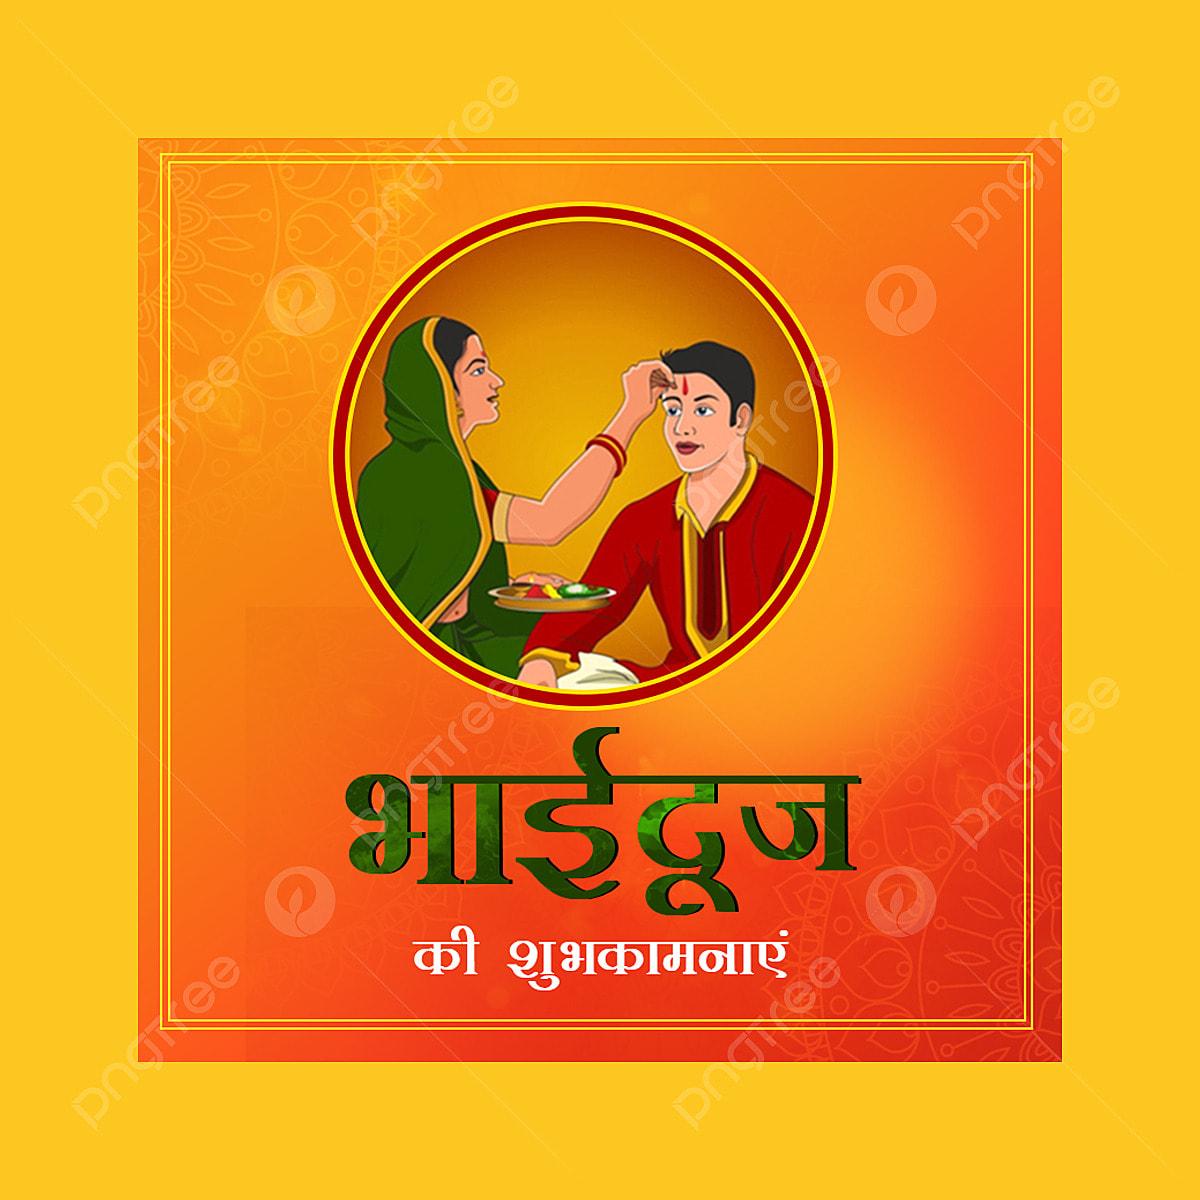 Bhai Dooj Message Bhai Dooj Bhai Dooj Creative Bhai Dooj Banner Png Transparent Clipart Image And Psd File For Free Download